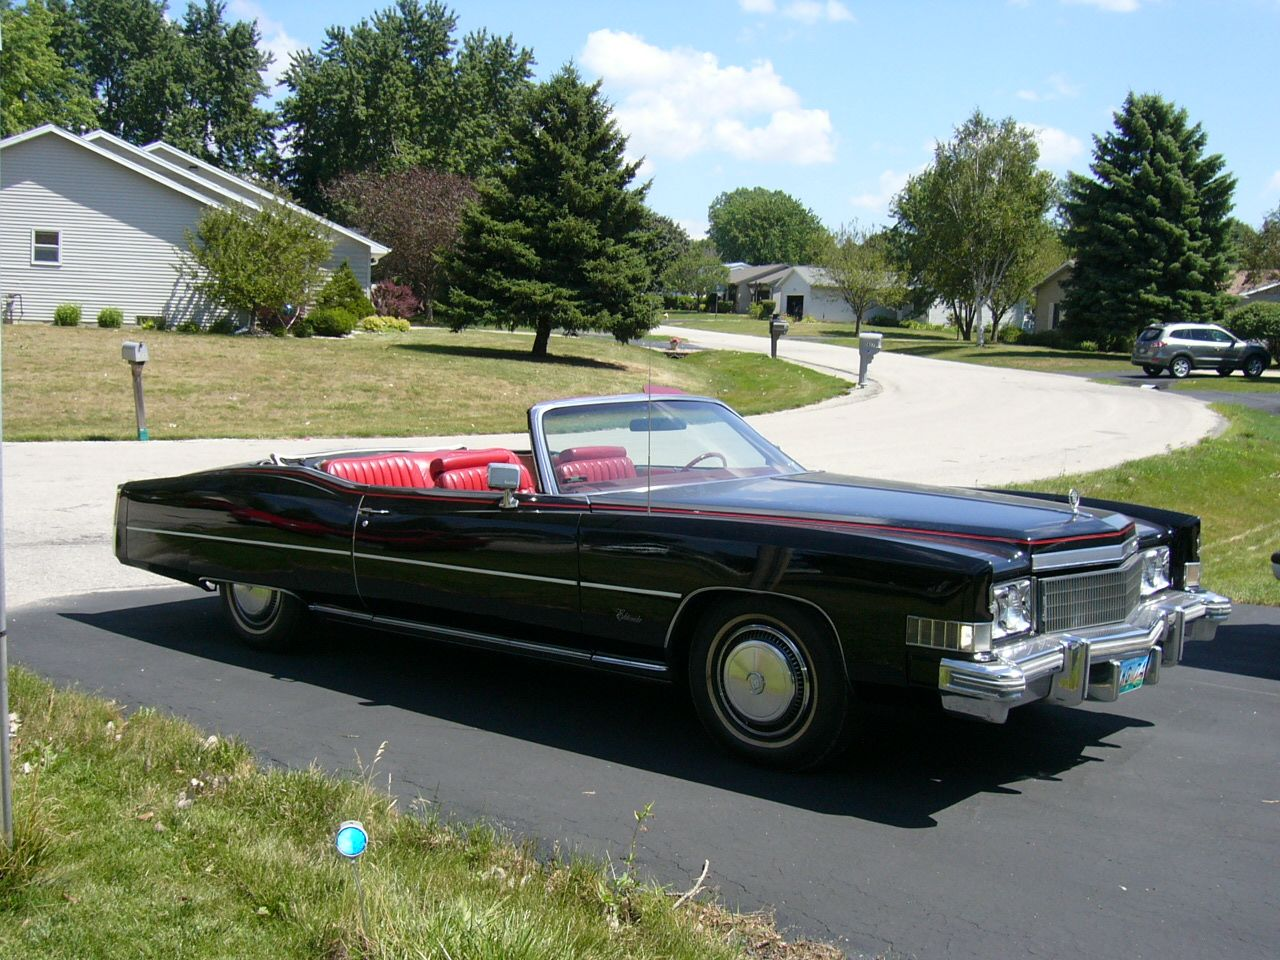 Classic 1974 Cadillac Eldorado Black for sale in Appleton